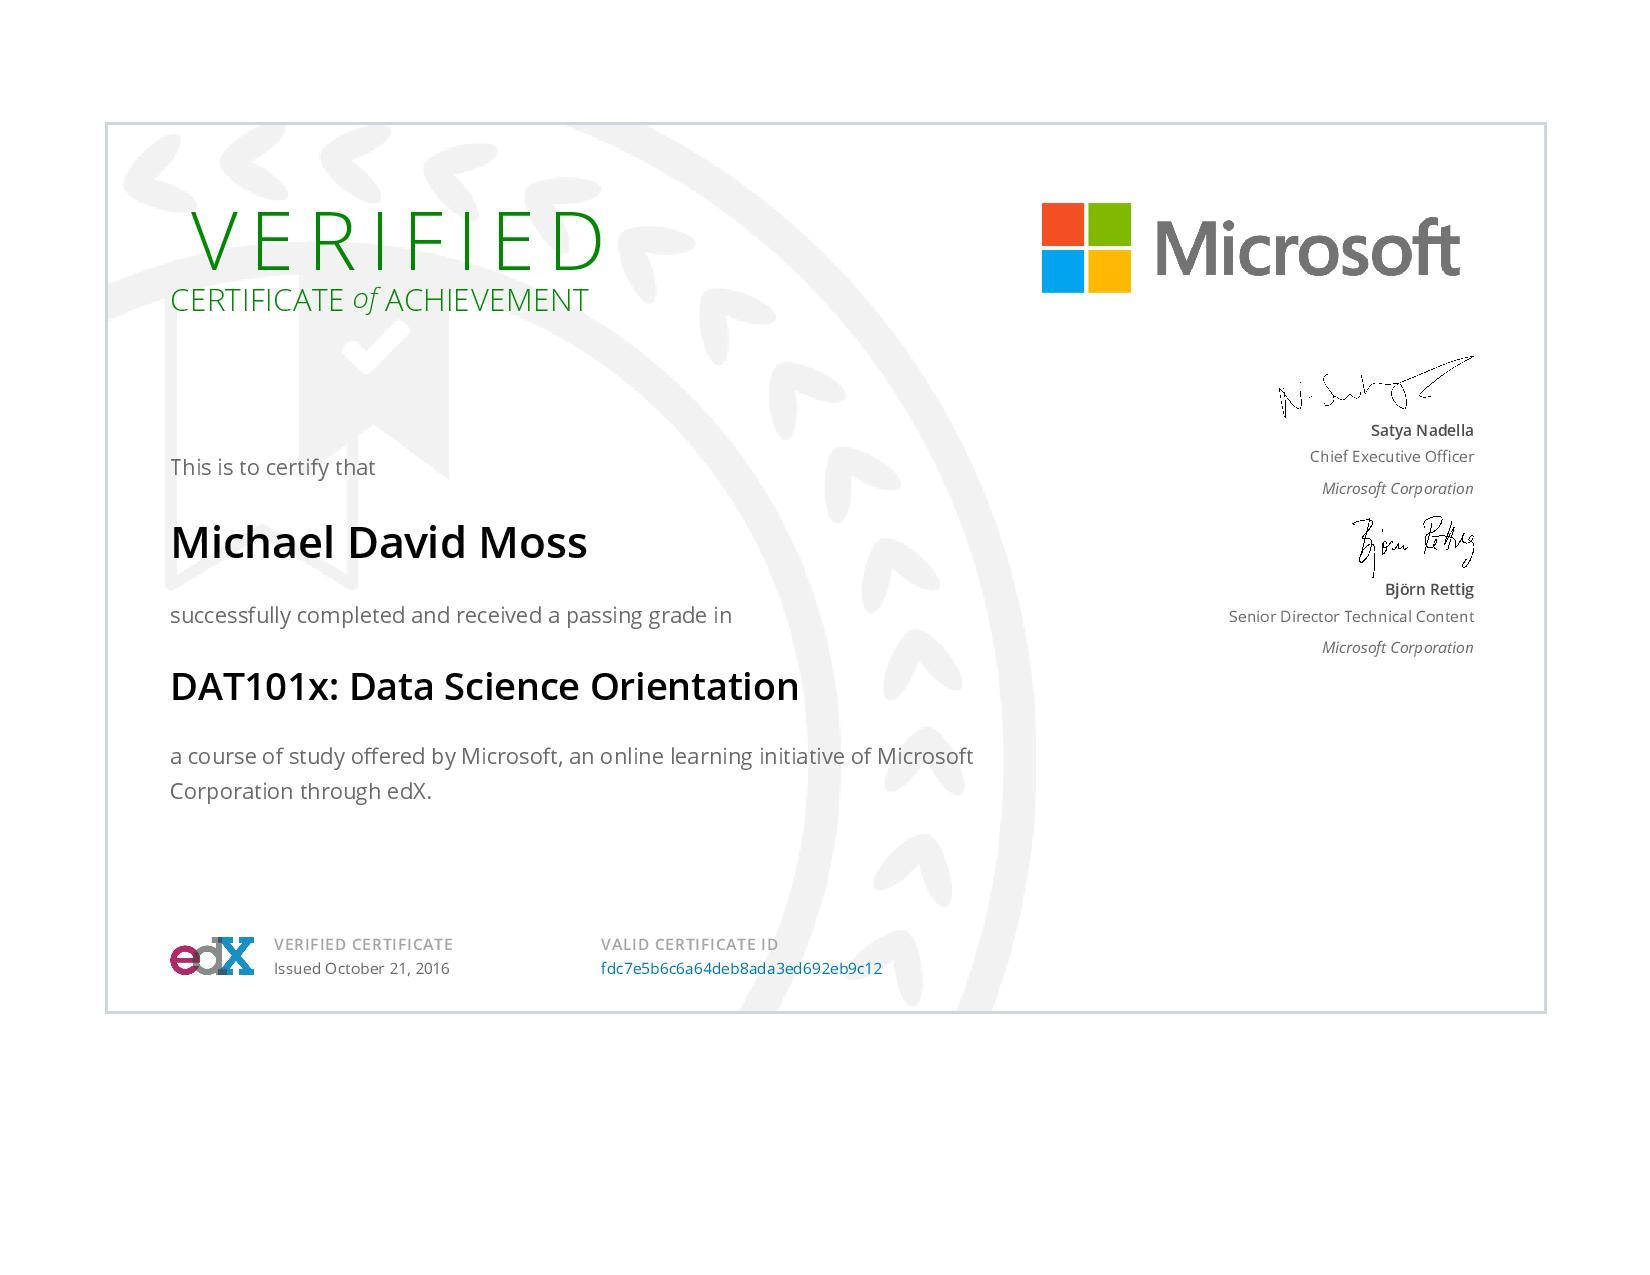 Data Science Orientation Certificate